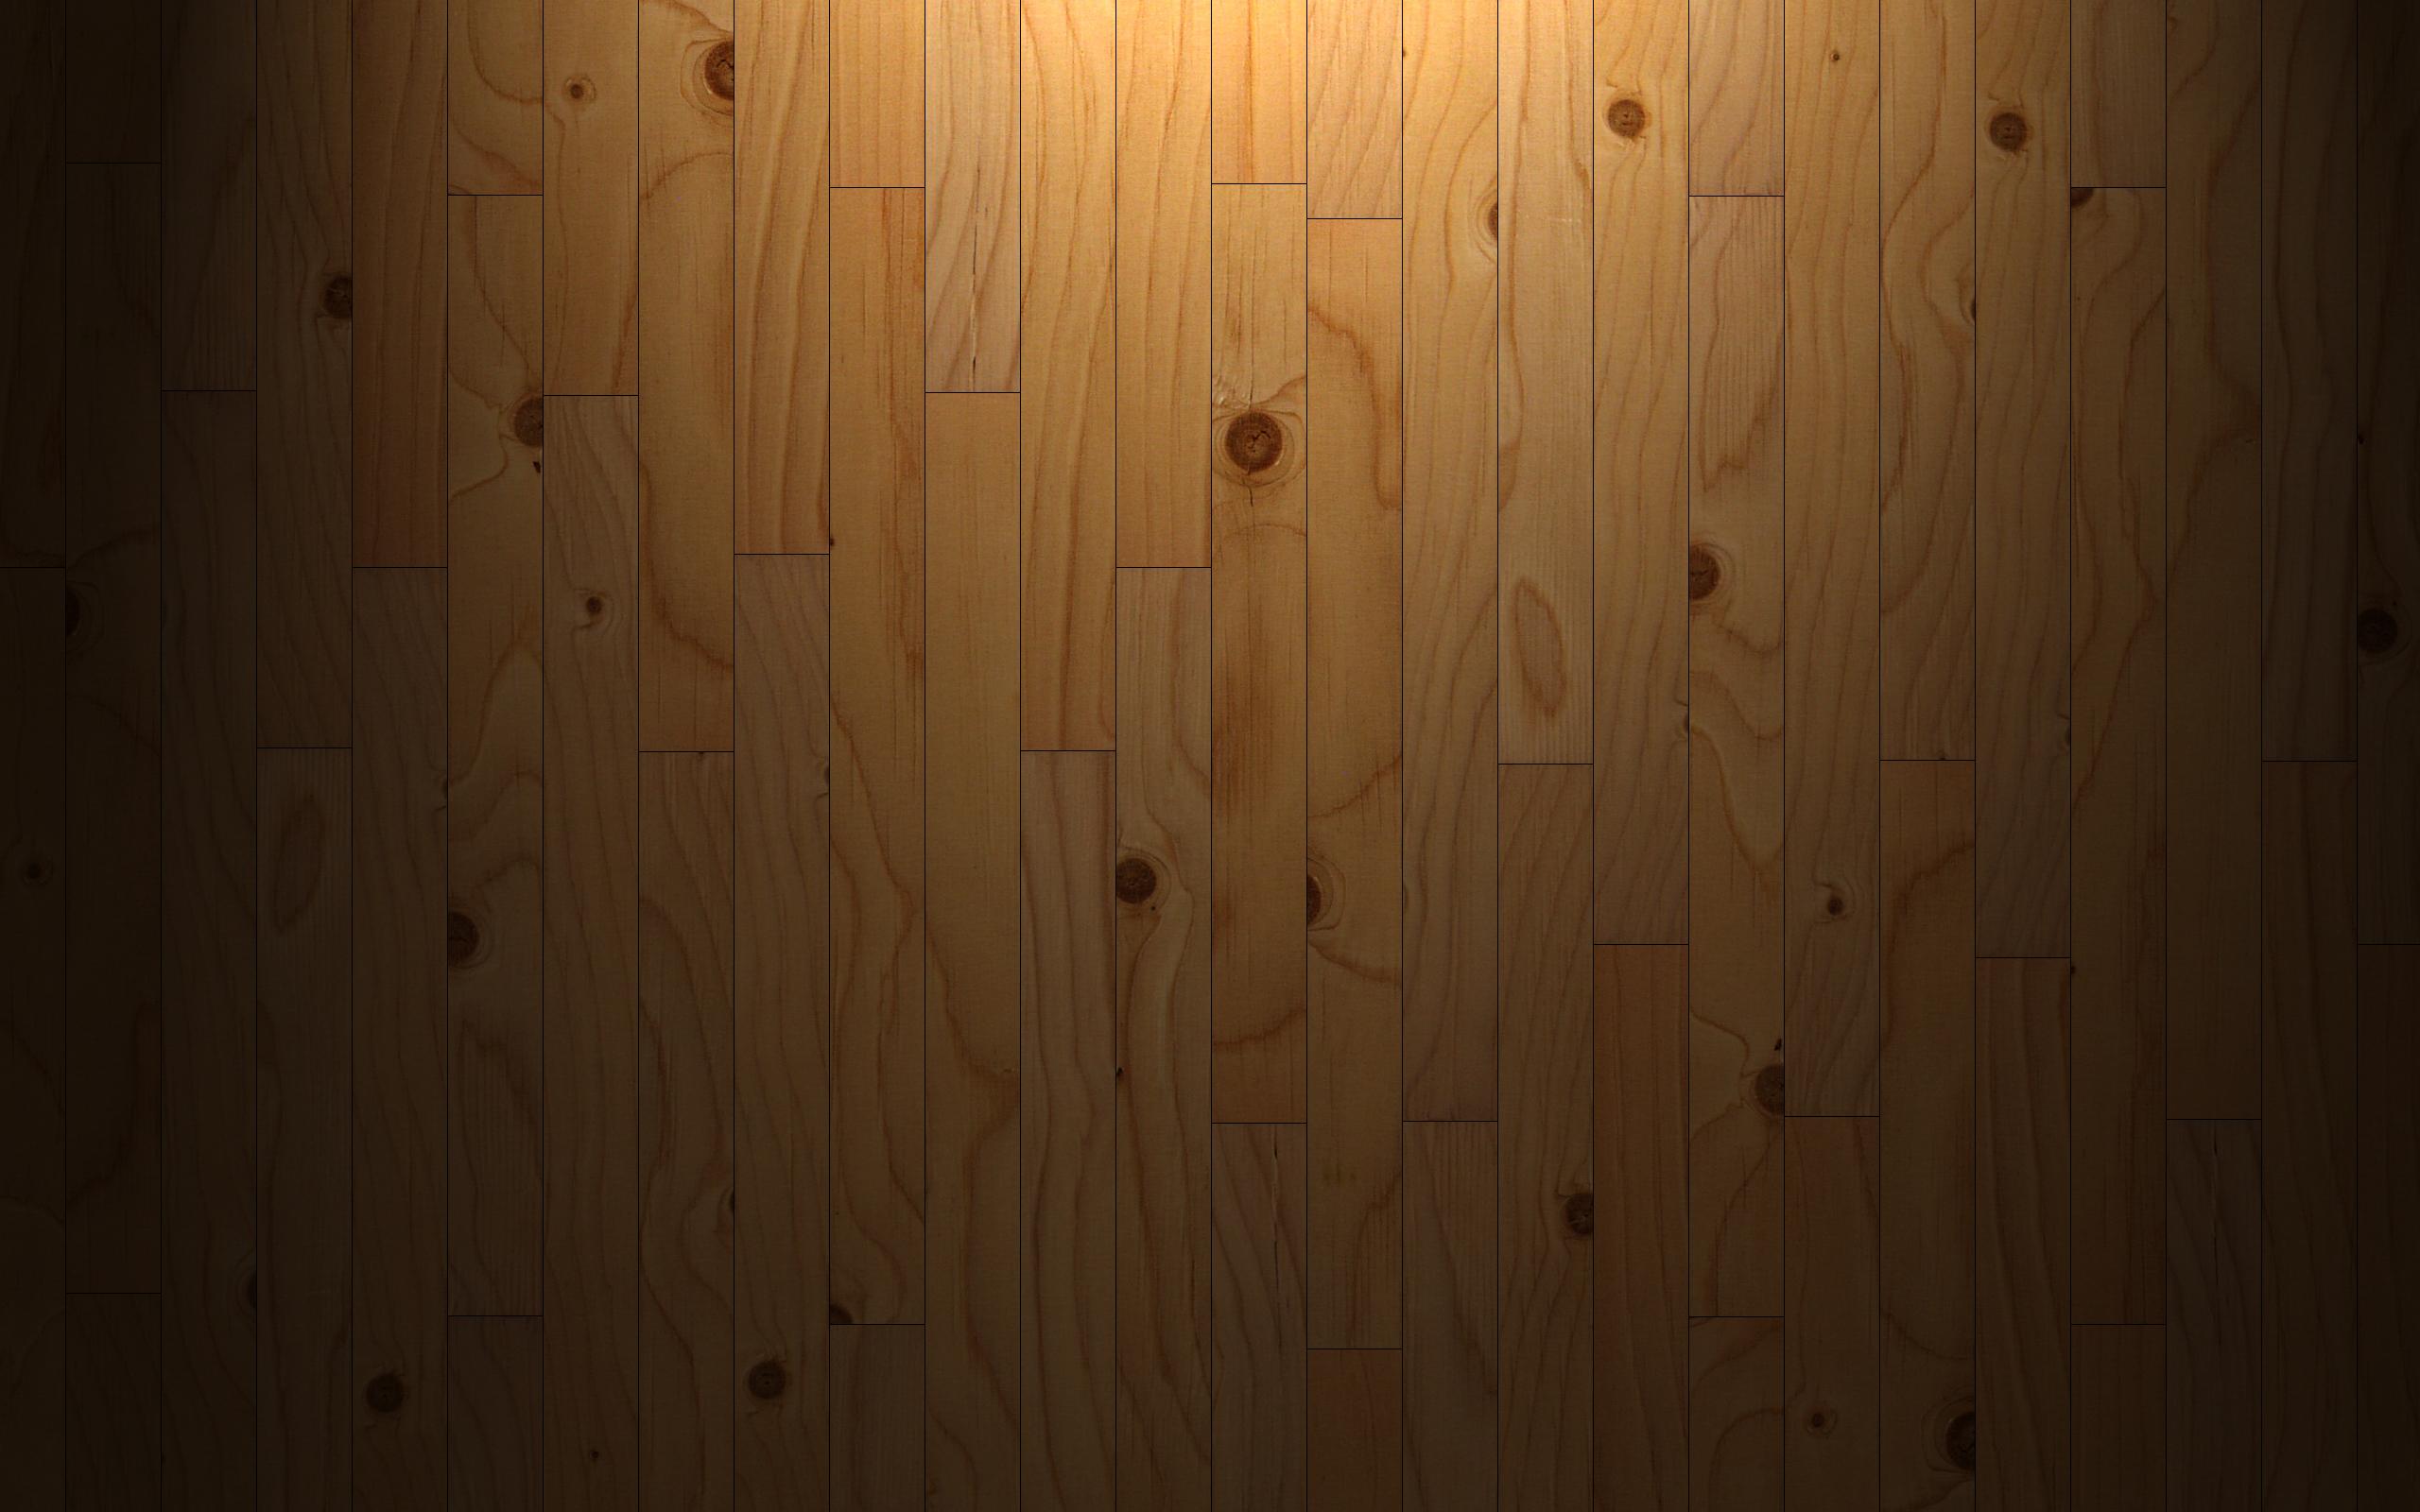 Wallpaper Wood Abstract 2560x1600 Noping 1591863 Hd